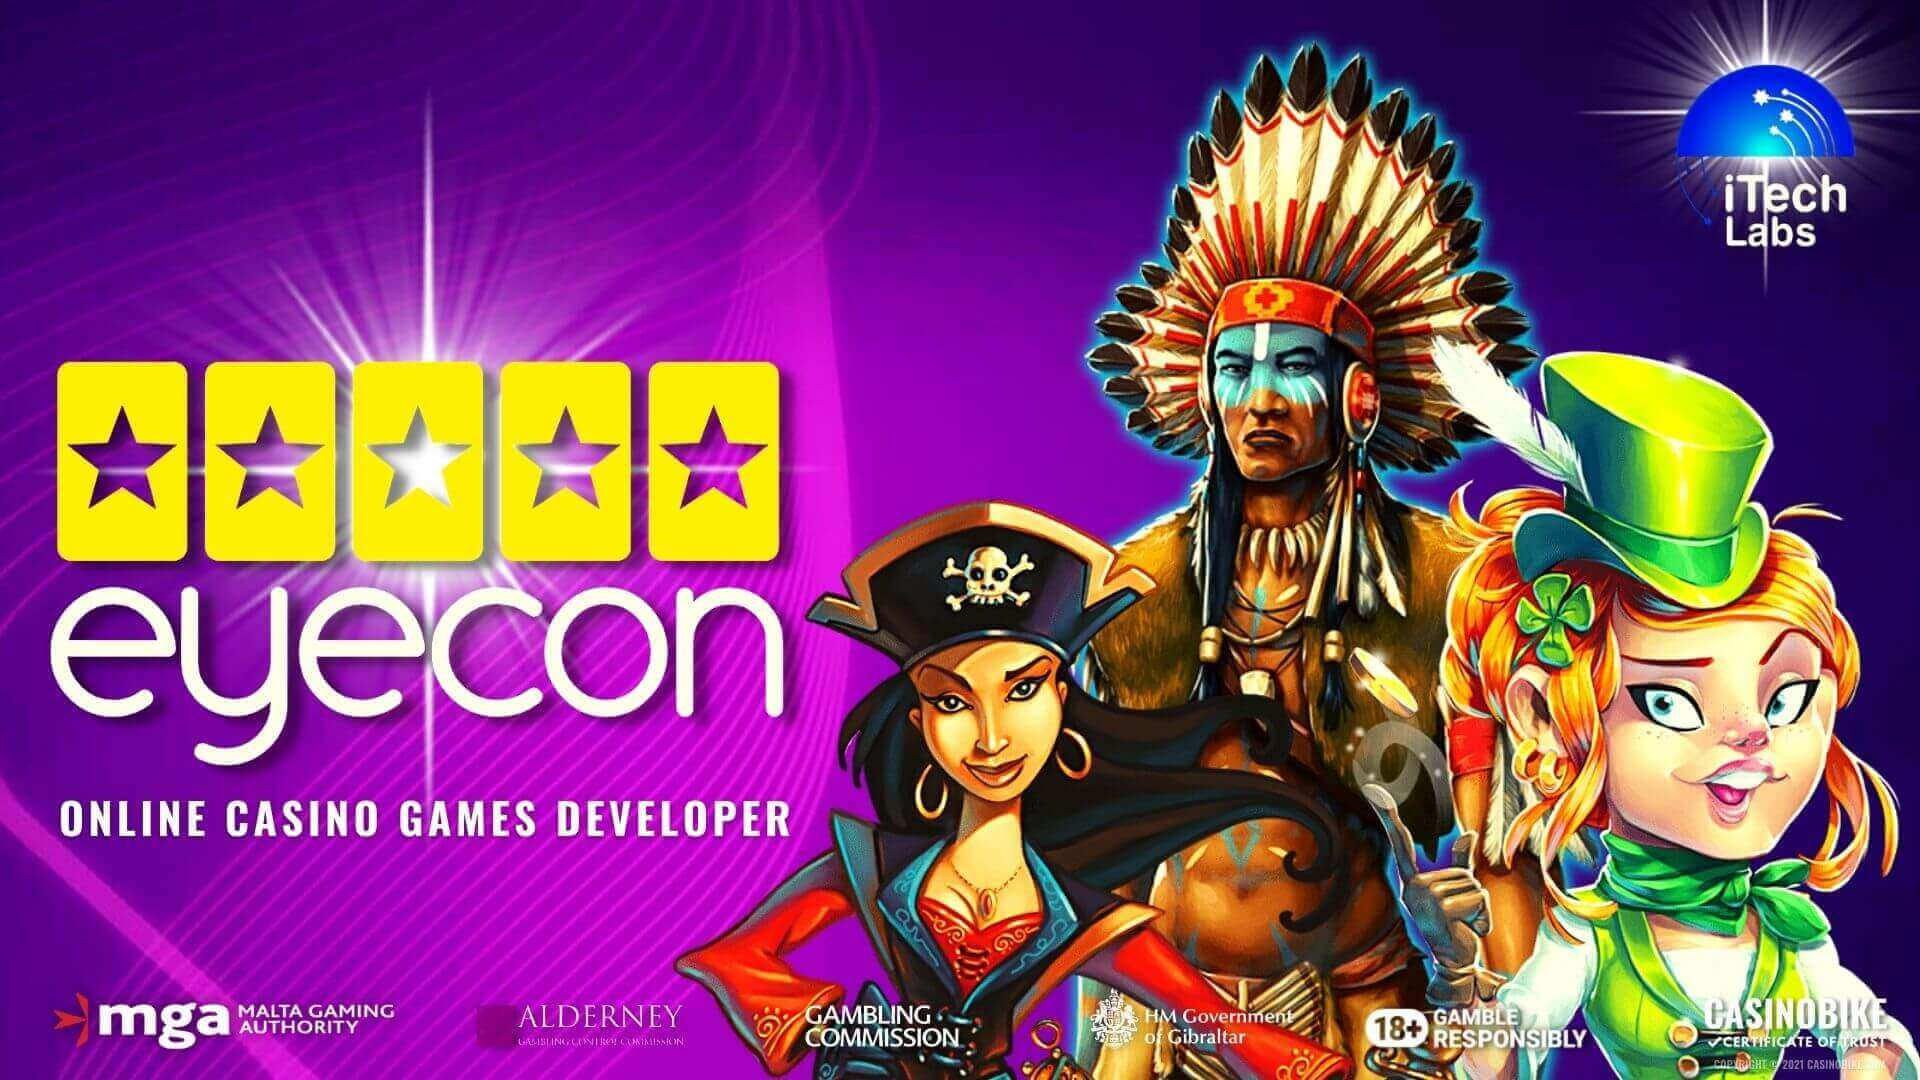 Eyecon Gaming Online Casino Games Developer